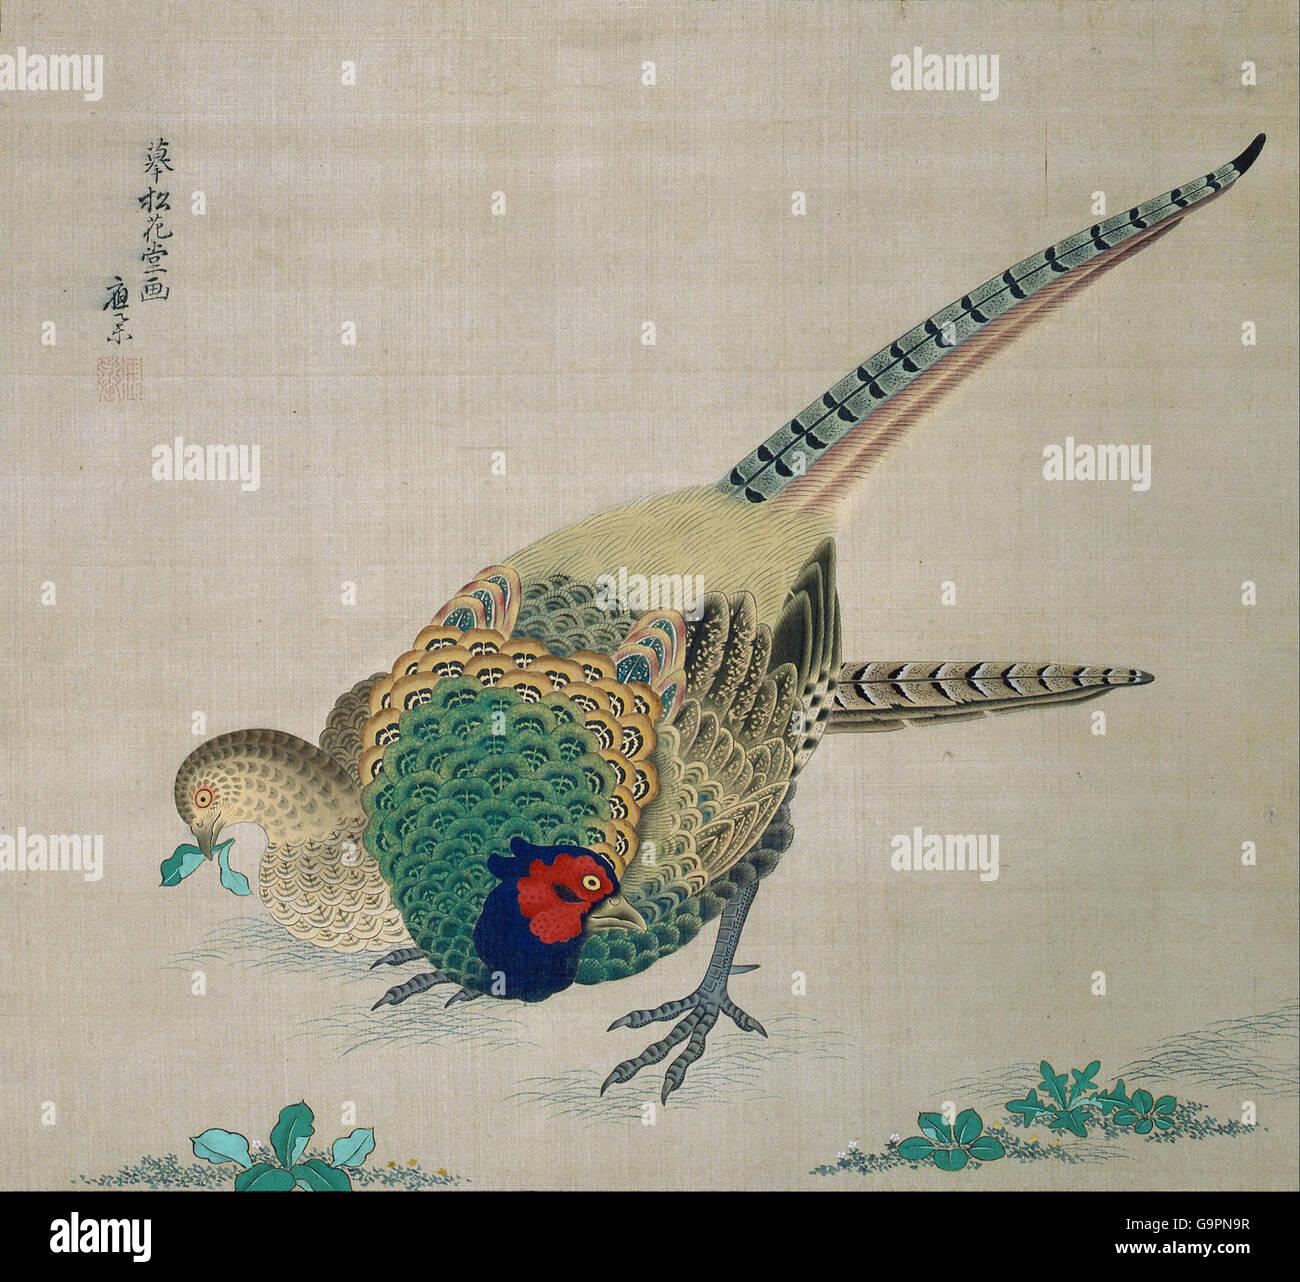 Maruyama Okyo - Hanging Scroll (pair of pheasants) - Stock Image